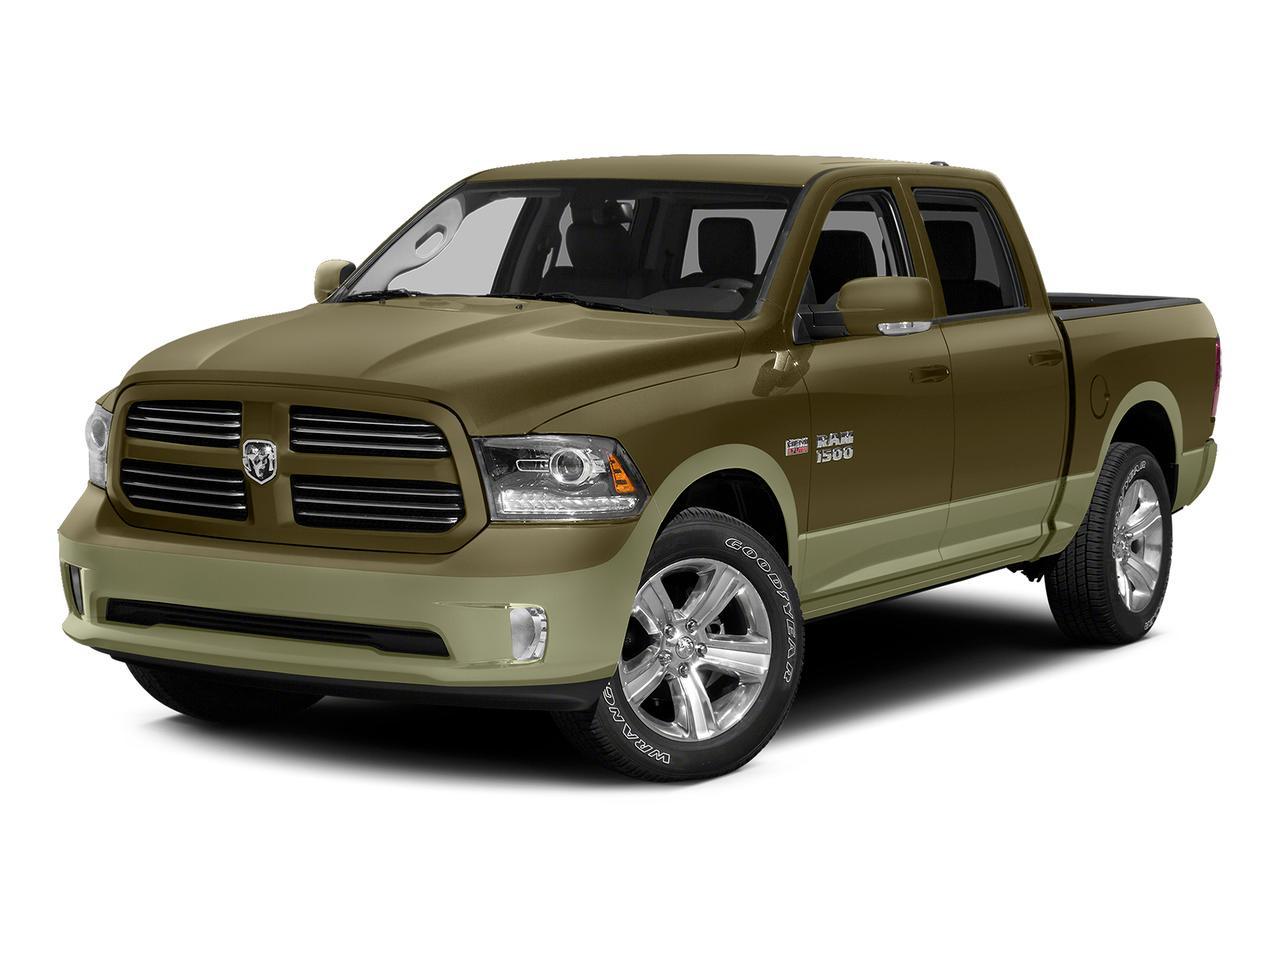 2015 Ram 1500 Vehicle Photo in King George, VA 22485